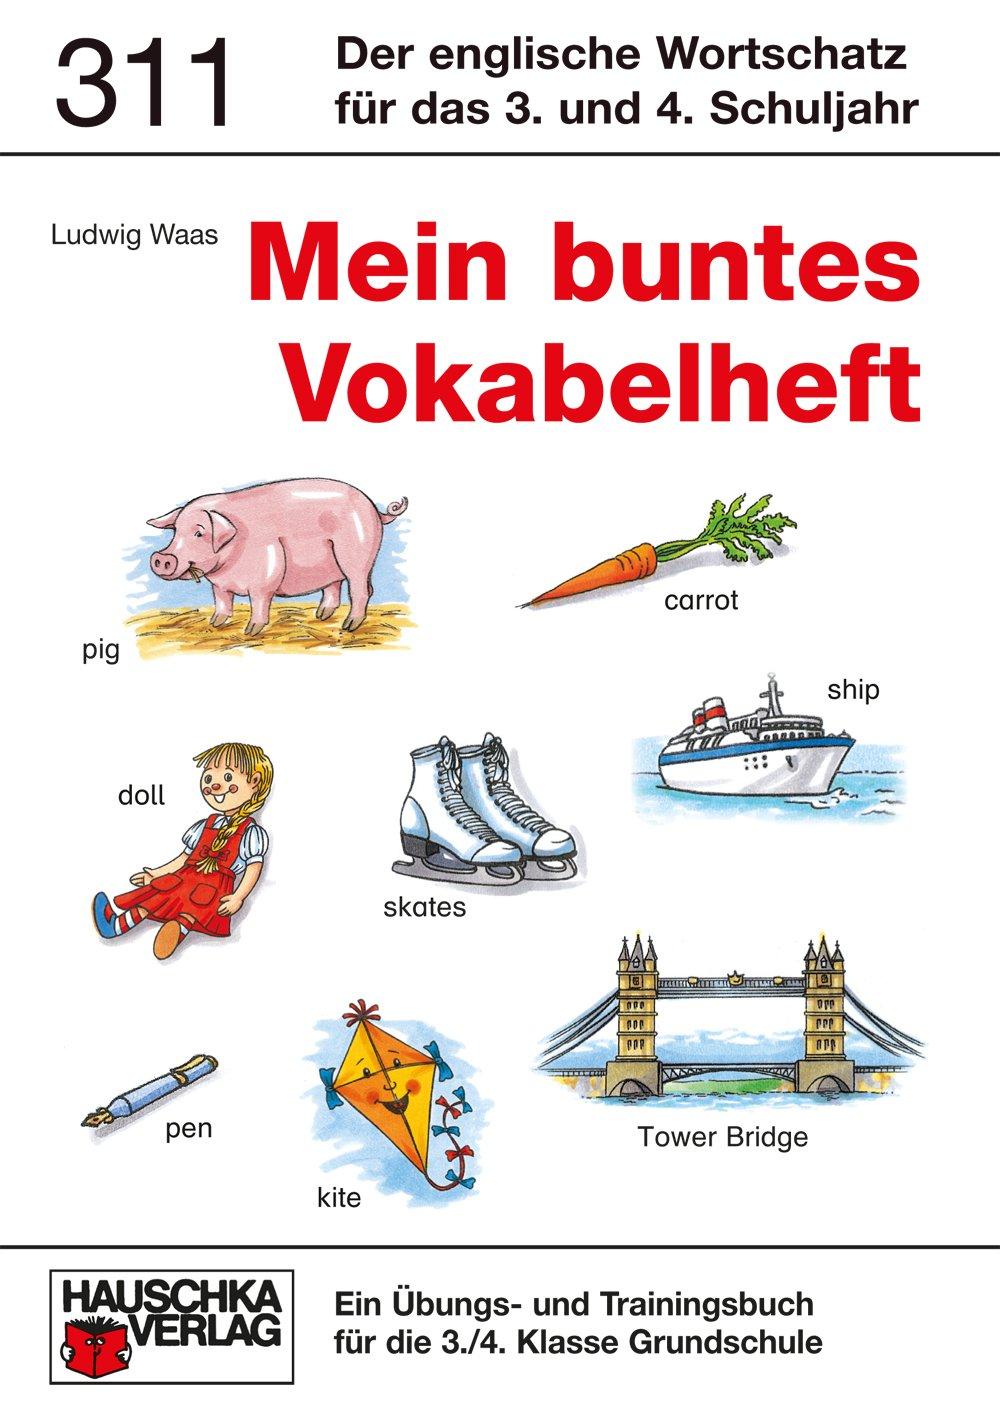 Mein buntes Vokabelheft. 20./20. Klasse, Grundschule  Ludwig Waas ...